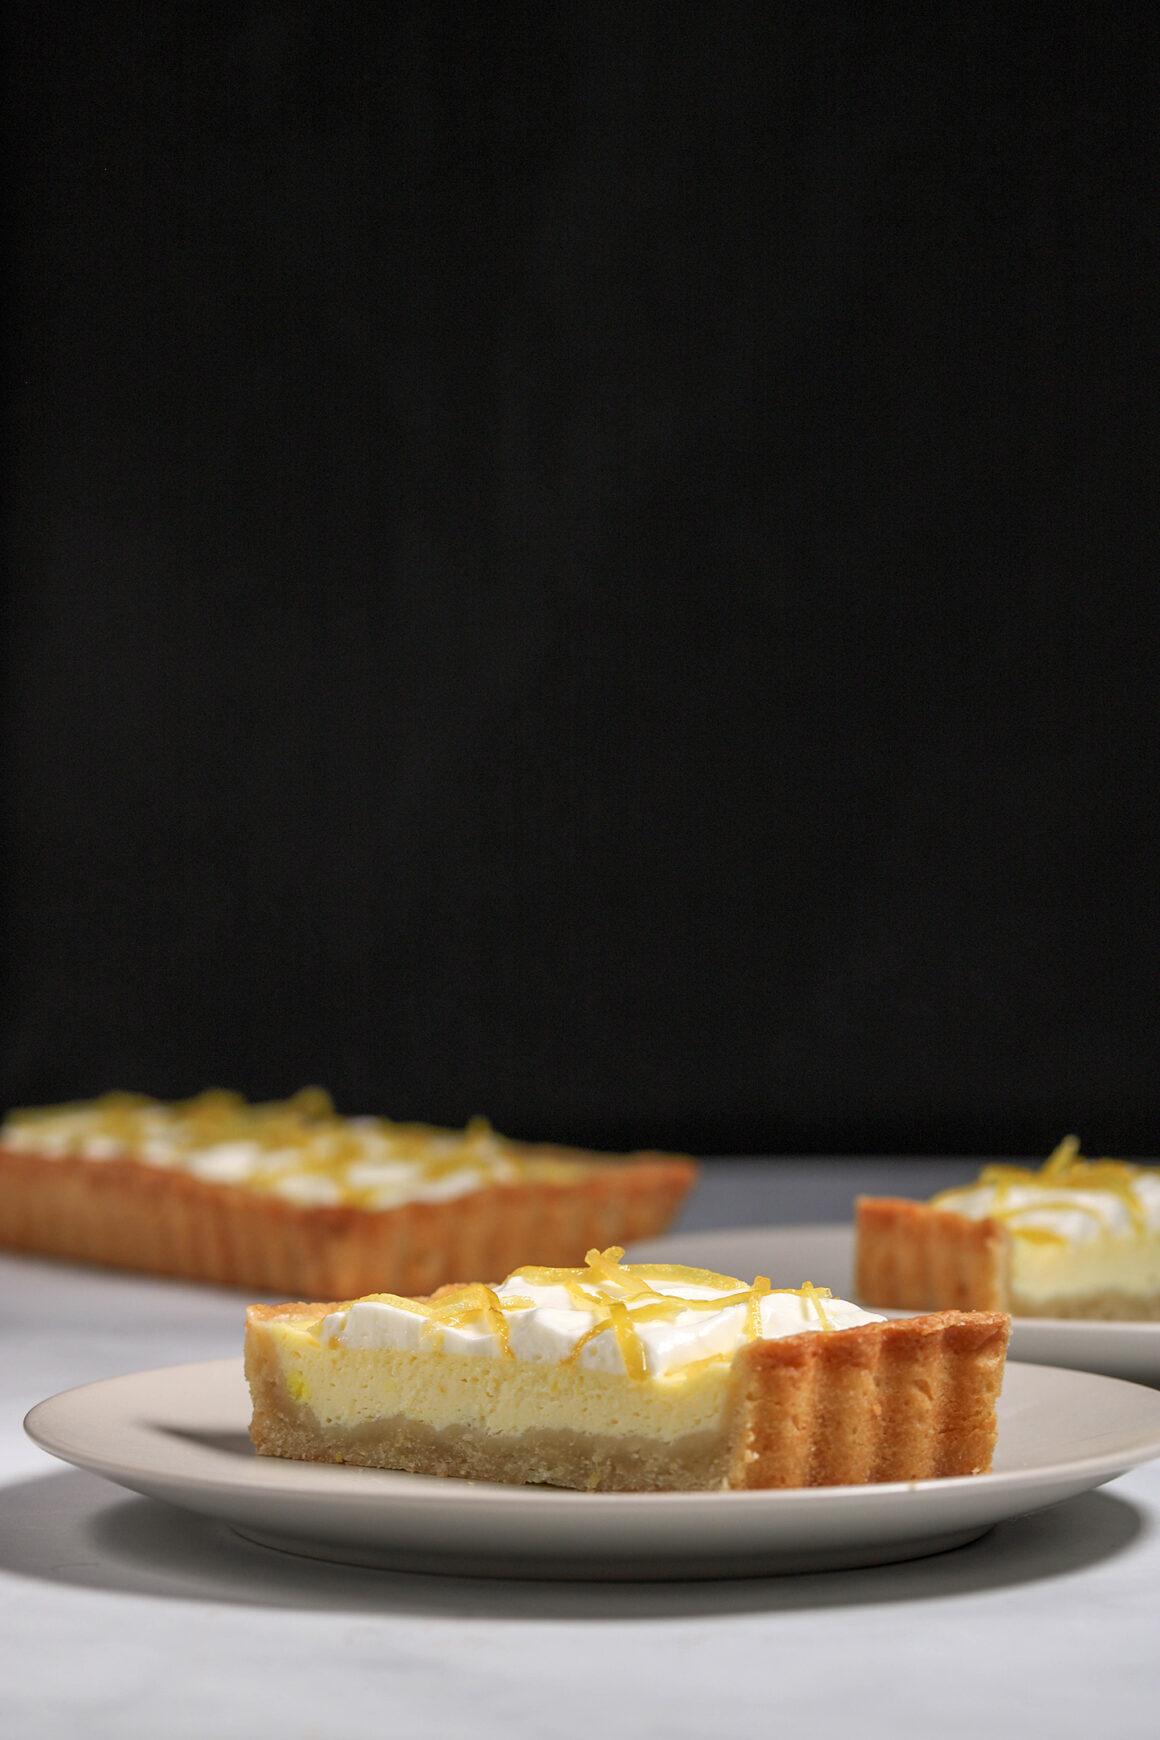 Lemon Mascarpone Tart Slice Closeup